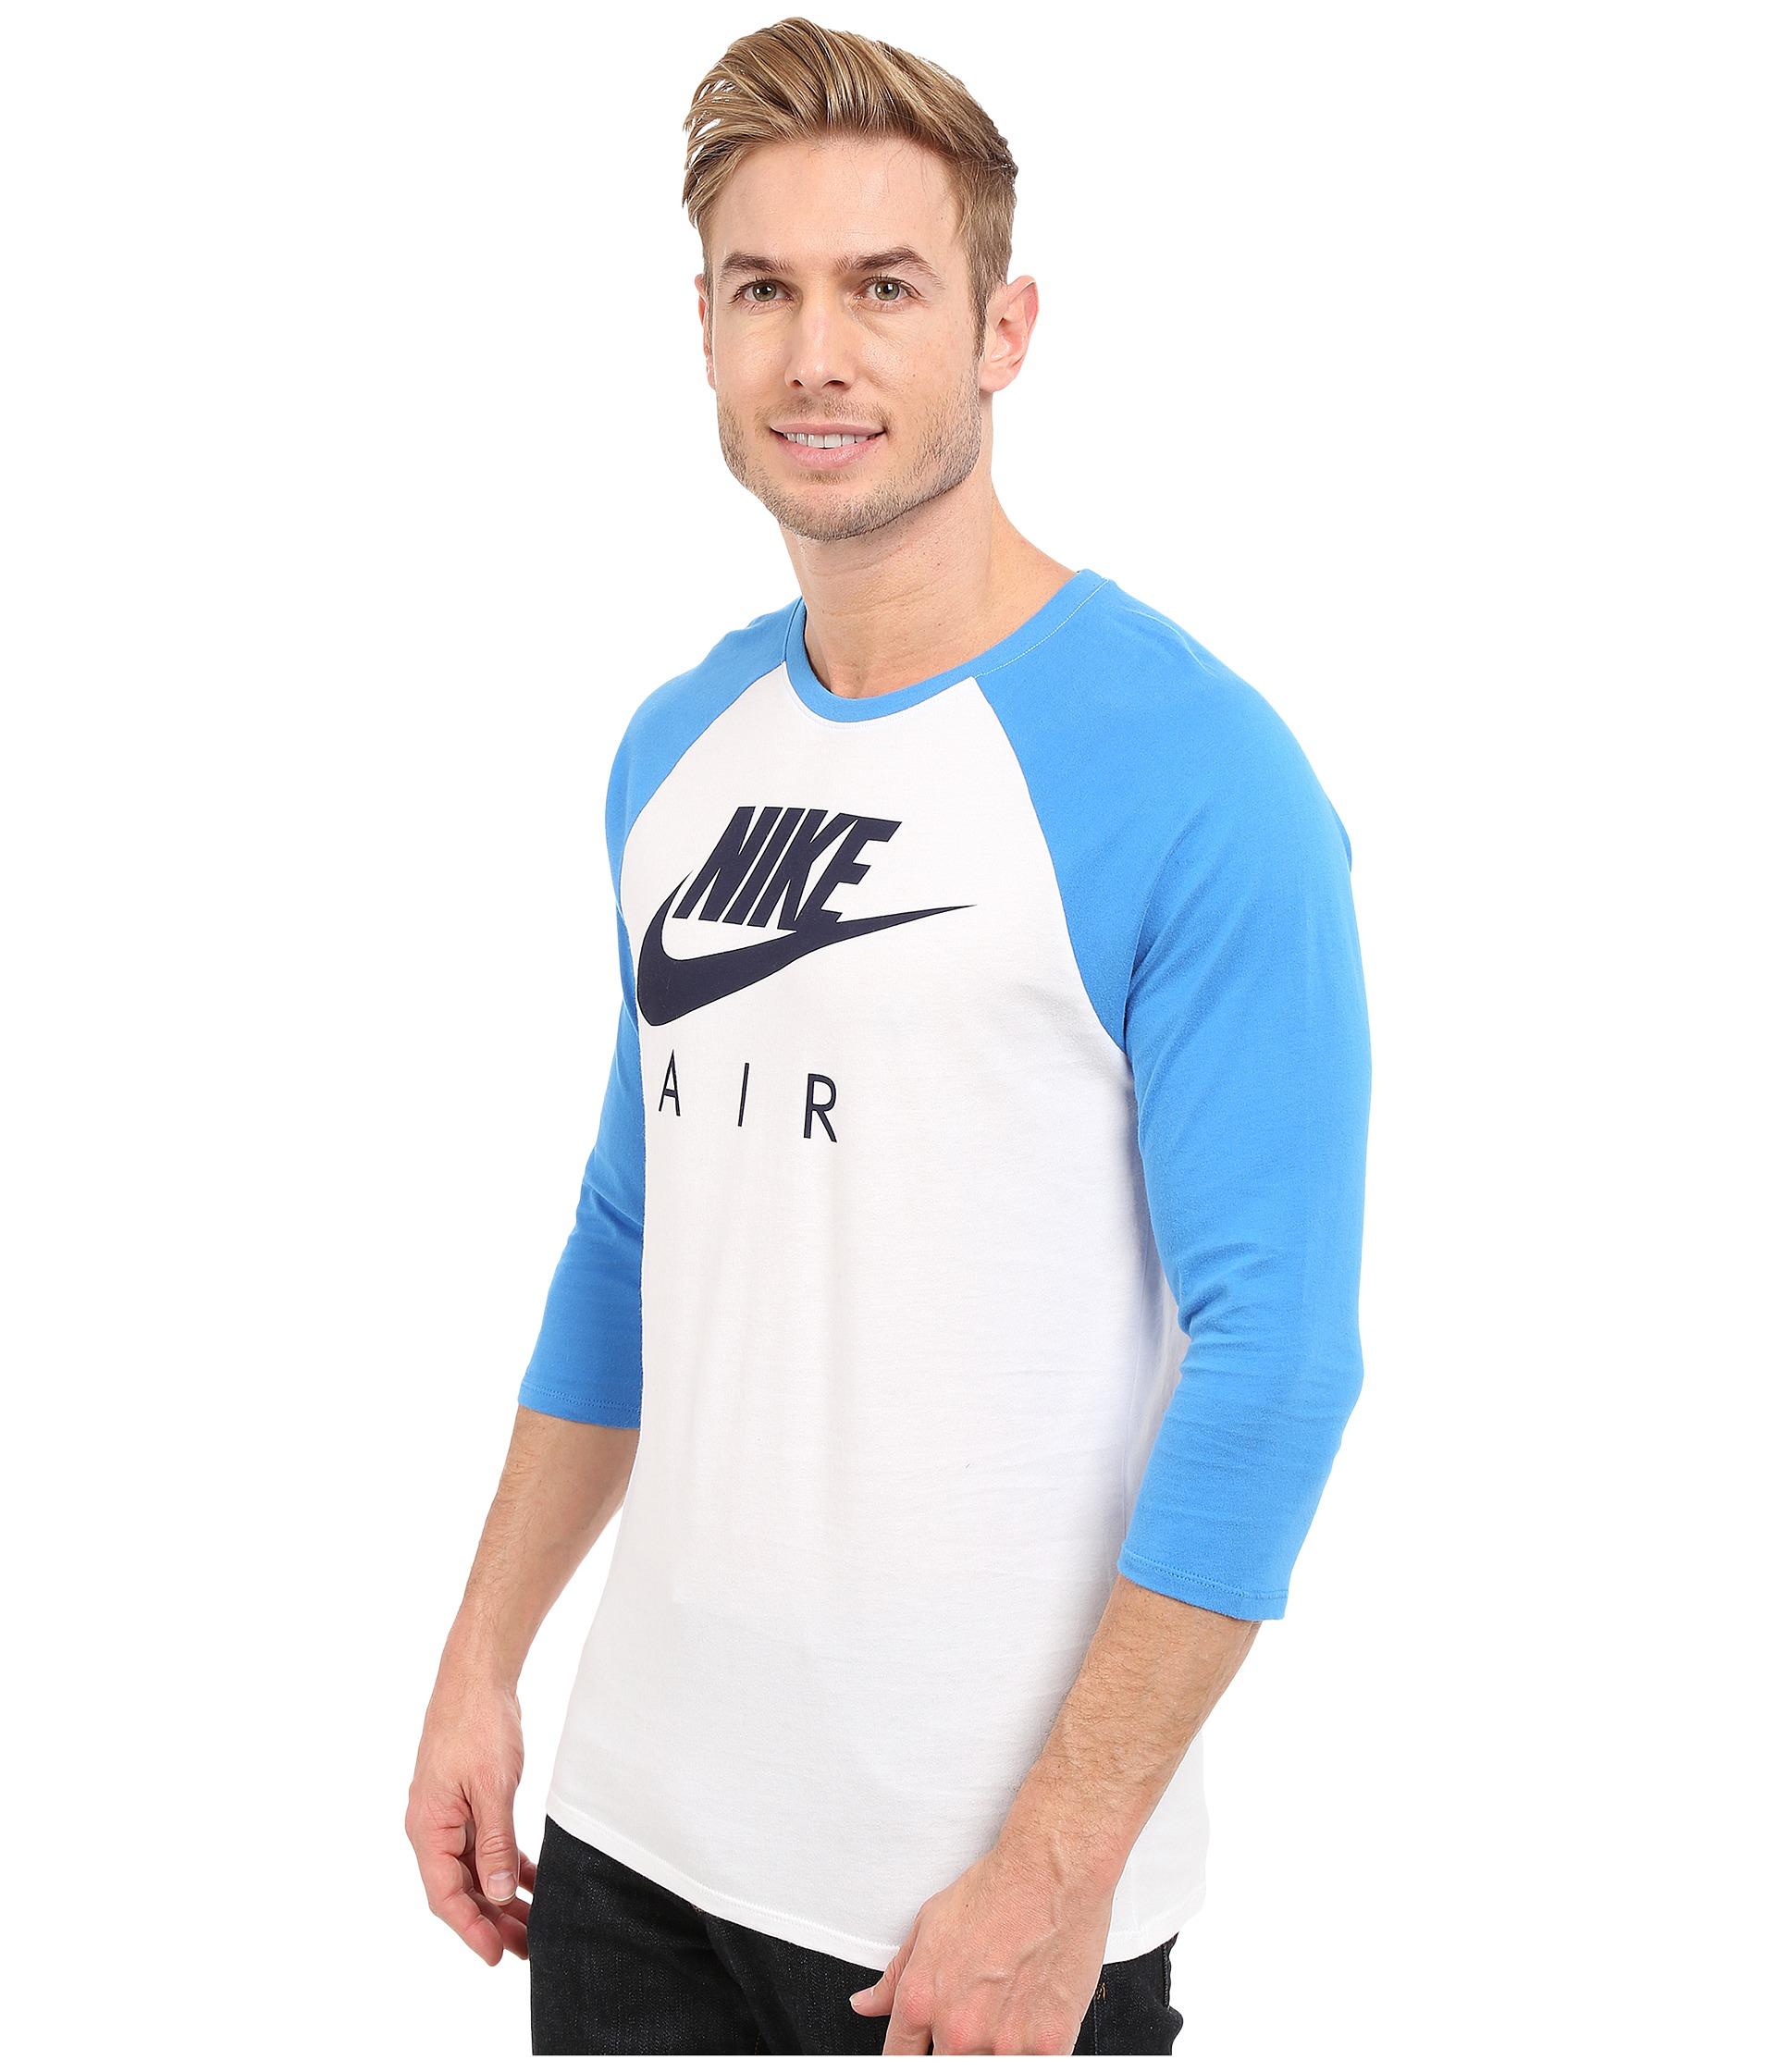 93b8227b Nike Air 3/4 Raglan Tee in Blue for Men - Lyst